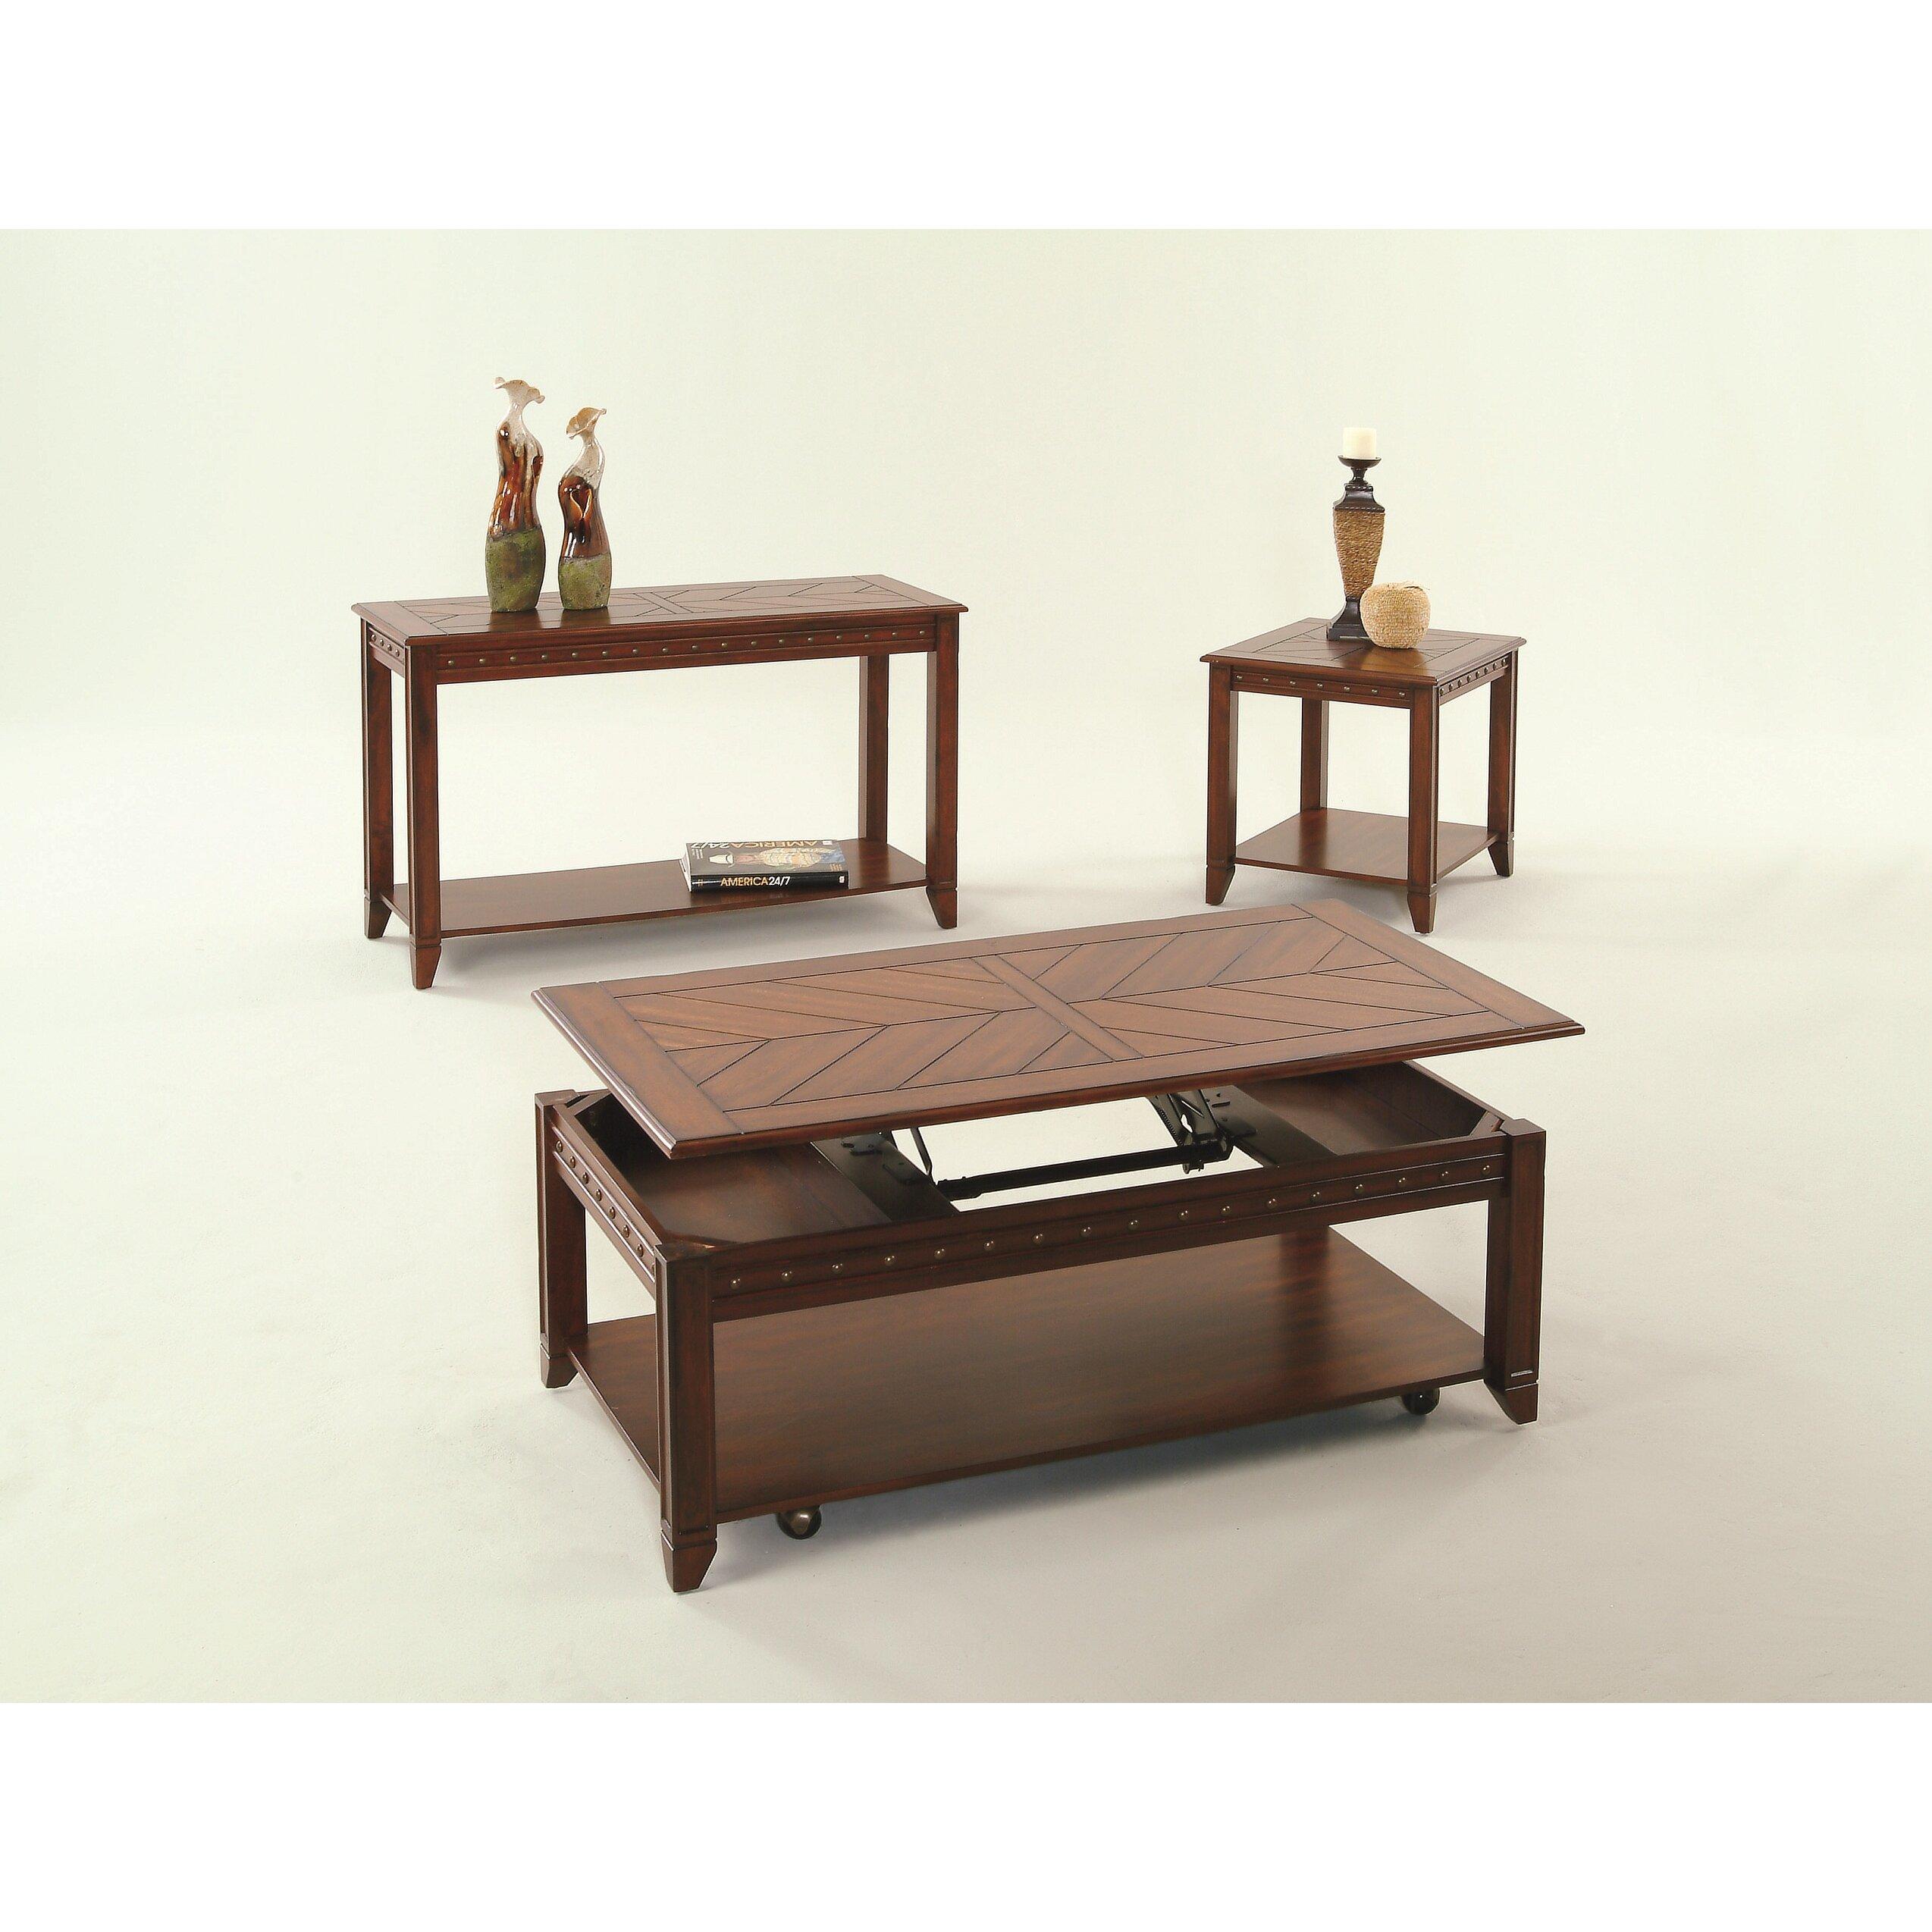 Progressive Furniture Redding Ridge Console Table Reviews Wayfair